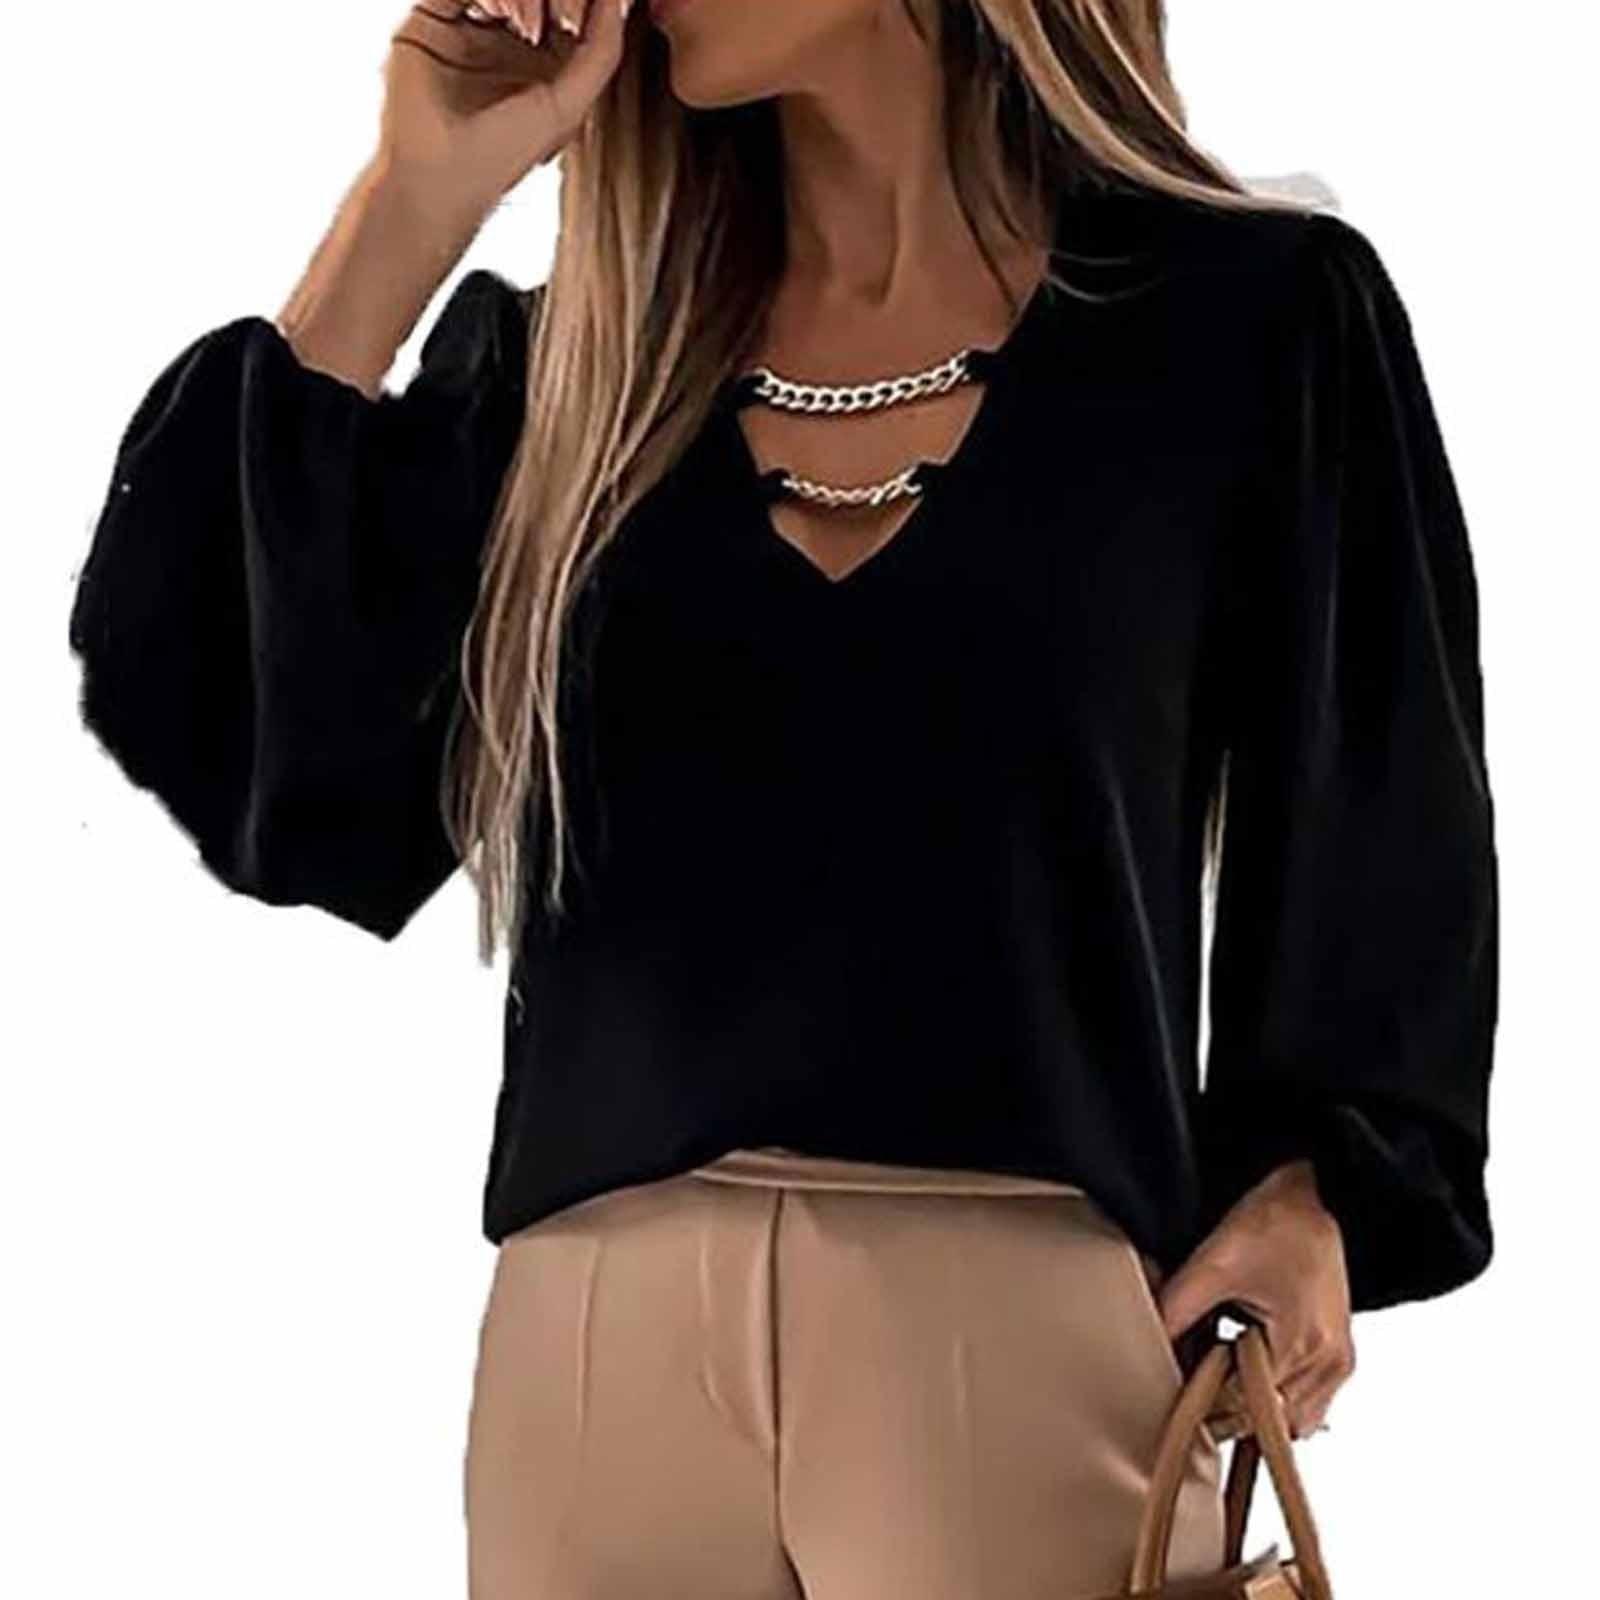 lantern Sleeve Chain Women's Blouses Fashion Spring Autumn Loose Long-sleeved Femme Clothing V-neck Western Style Female Shirt